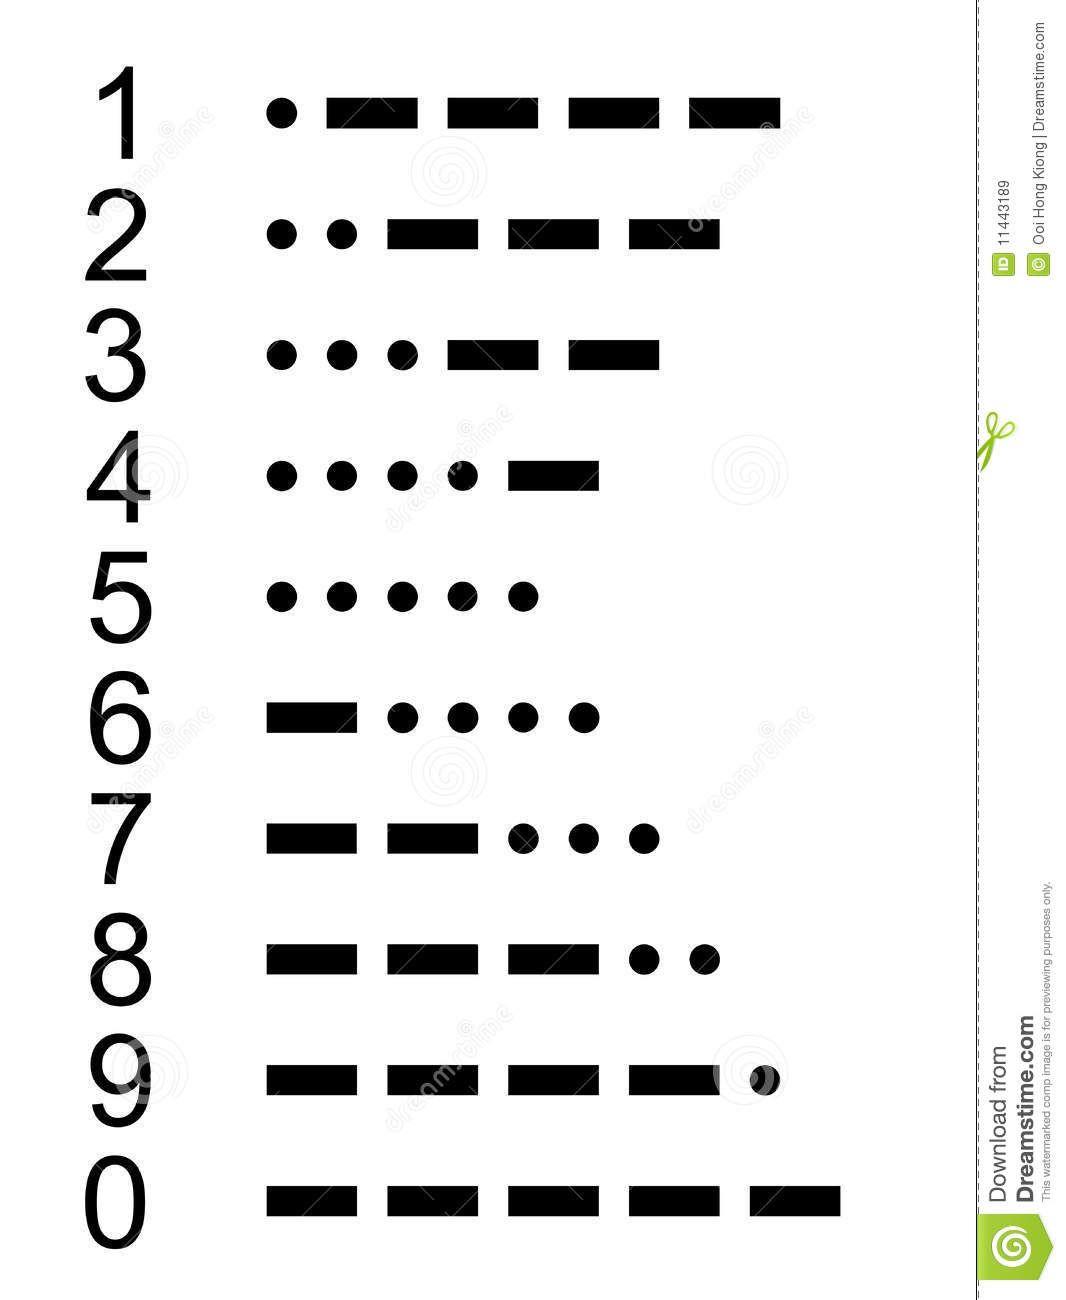 Morse Code: A visual guide : LearnUselessTalents